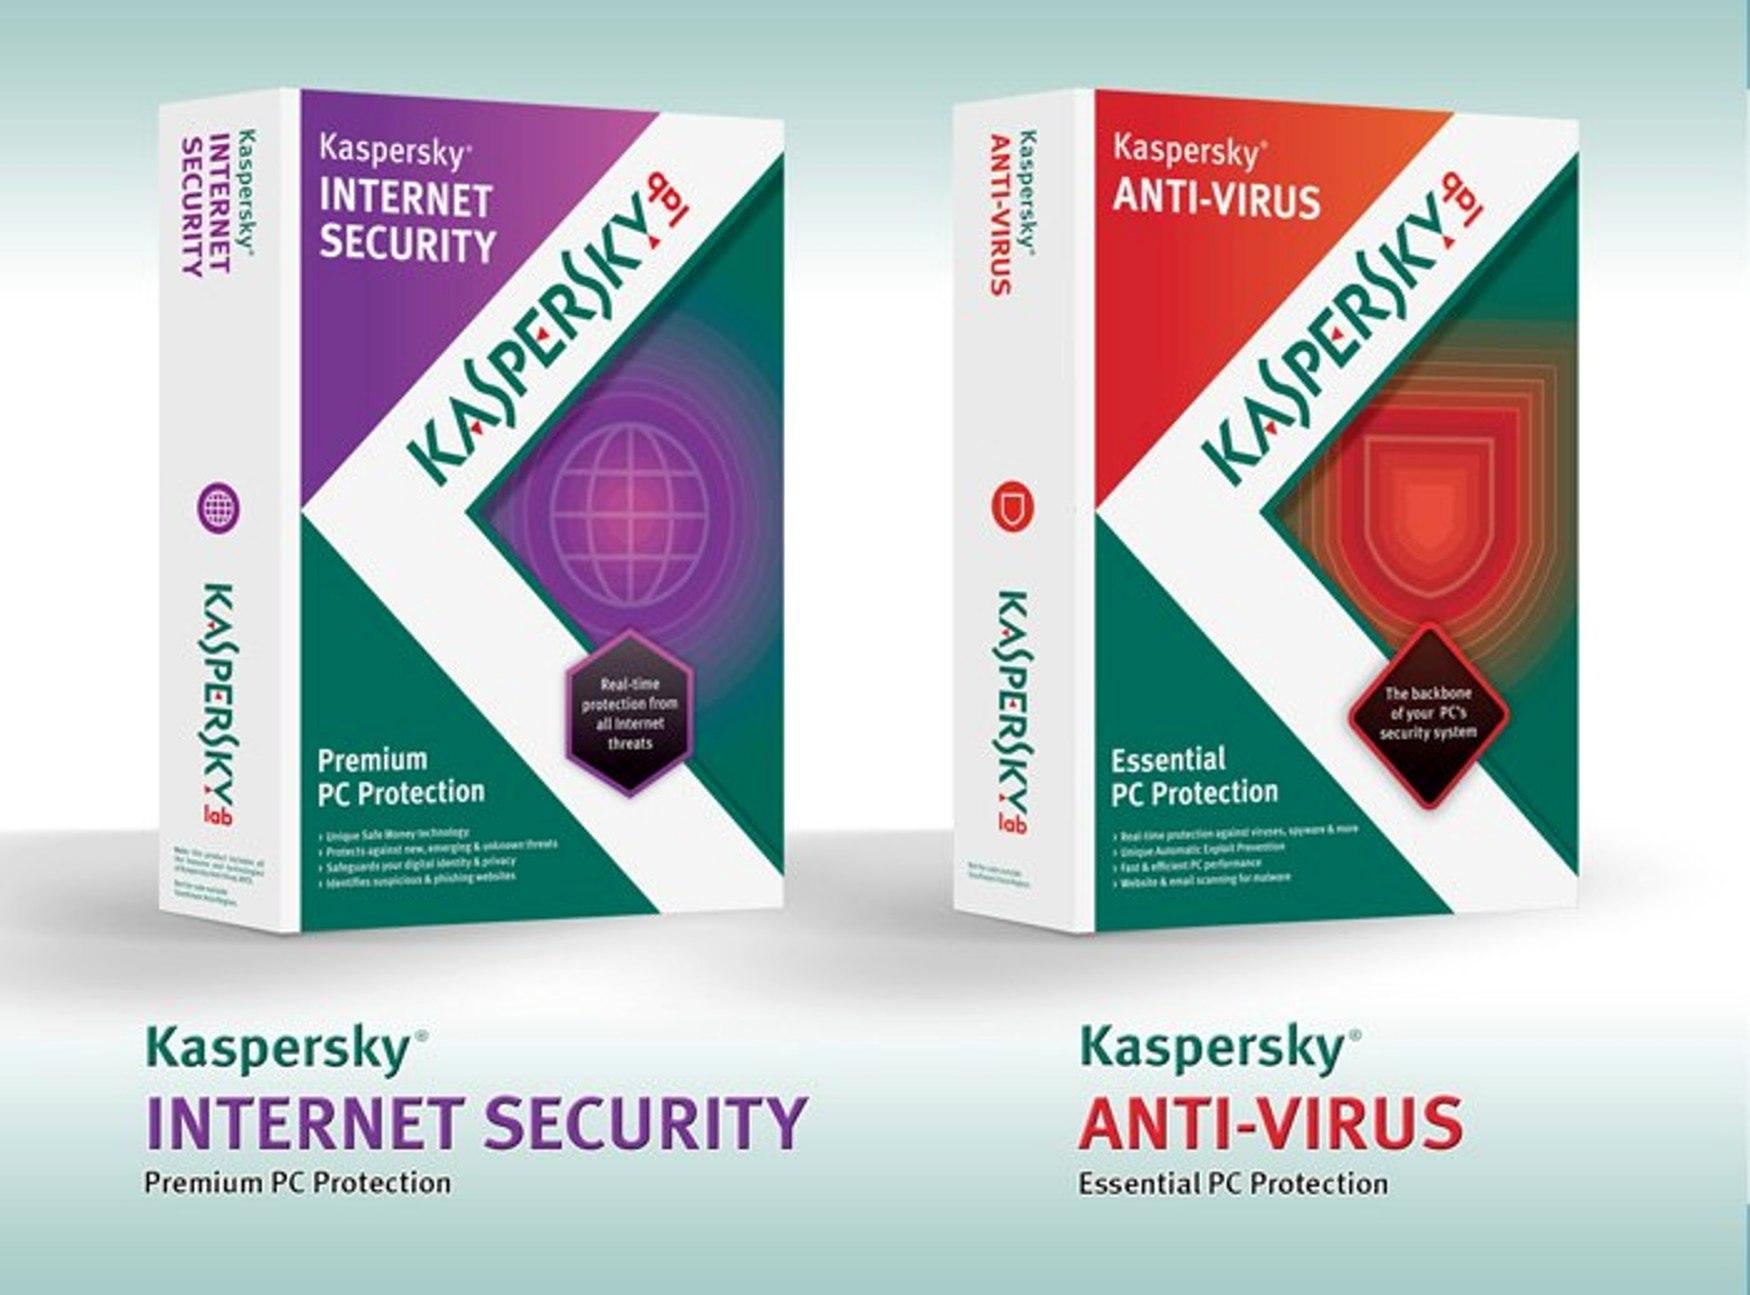 Kaspersky 2014 2015 4 0 0 14 Trial Reset Lisanslama Resimli Anlatım